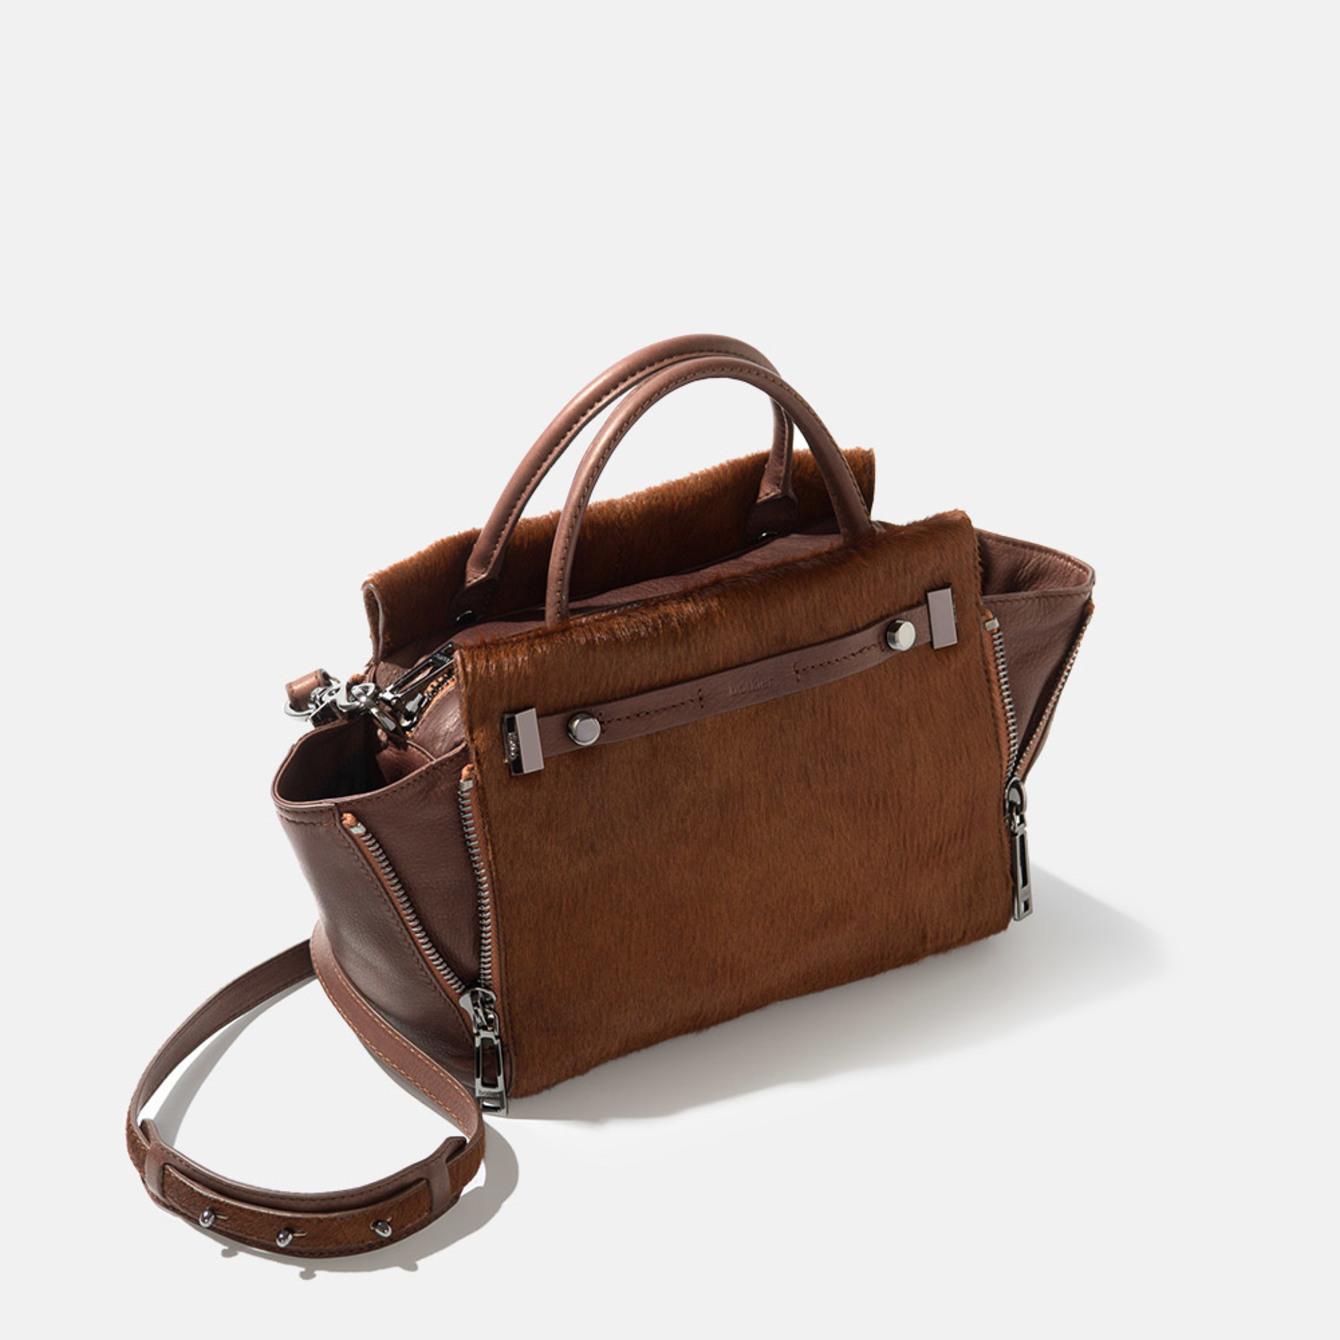 Designer leather satchel